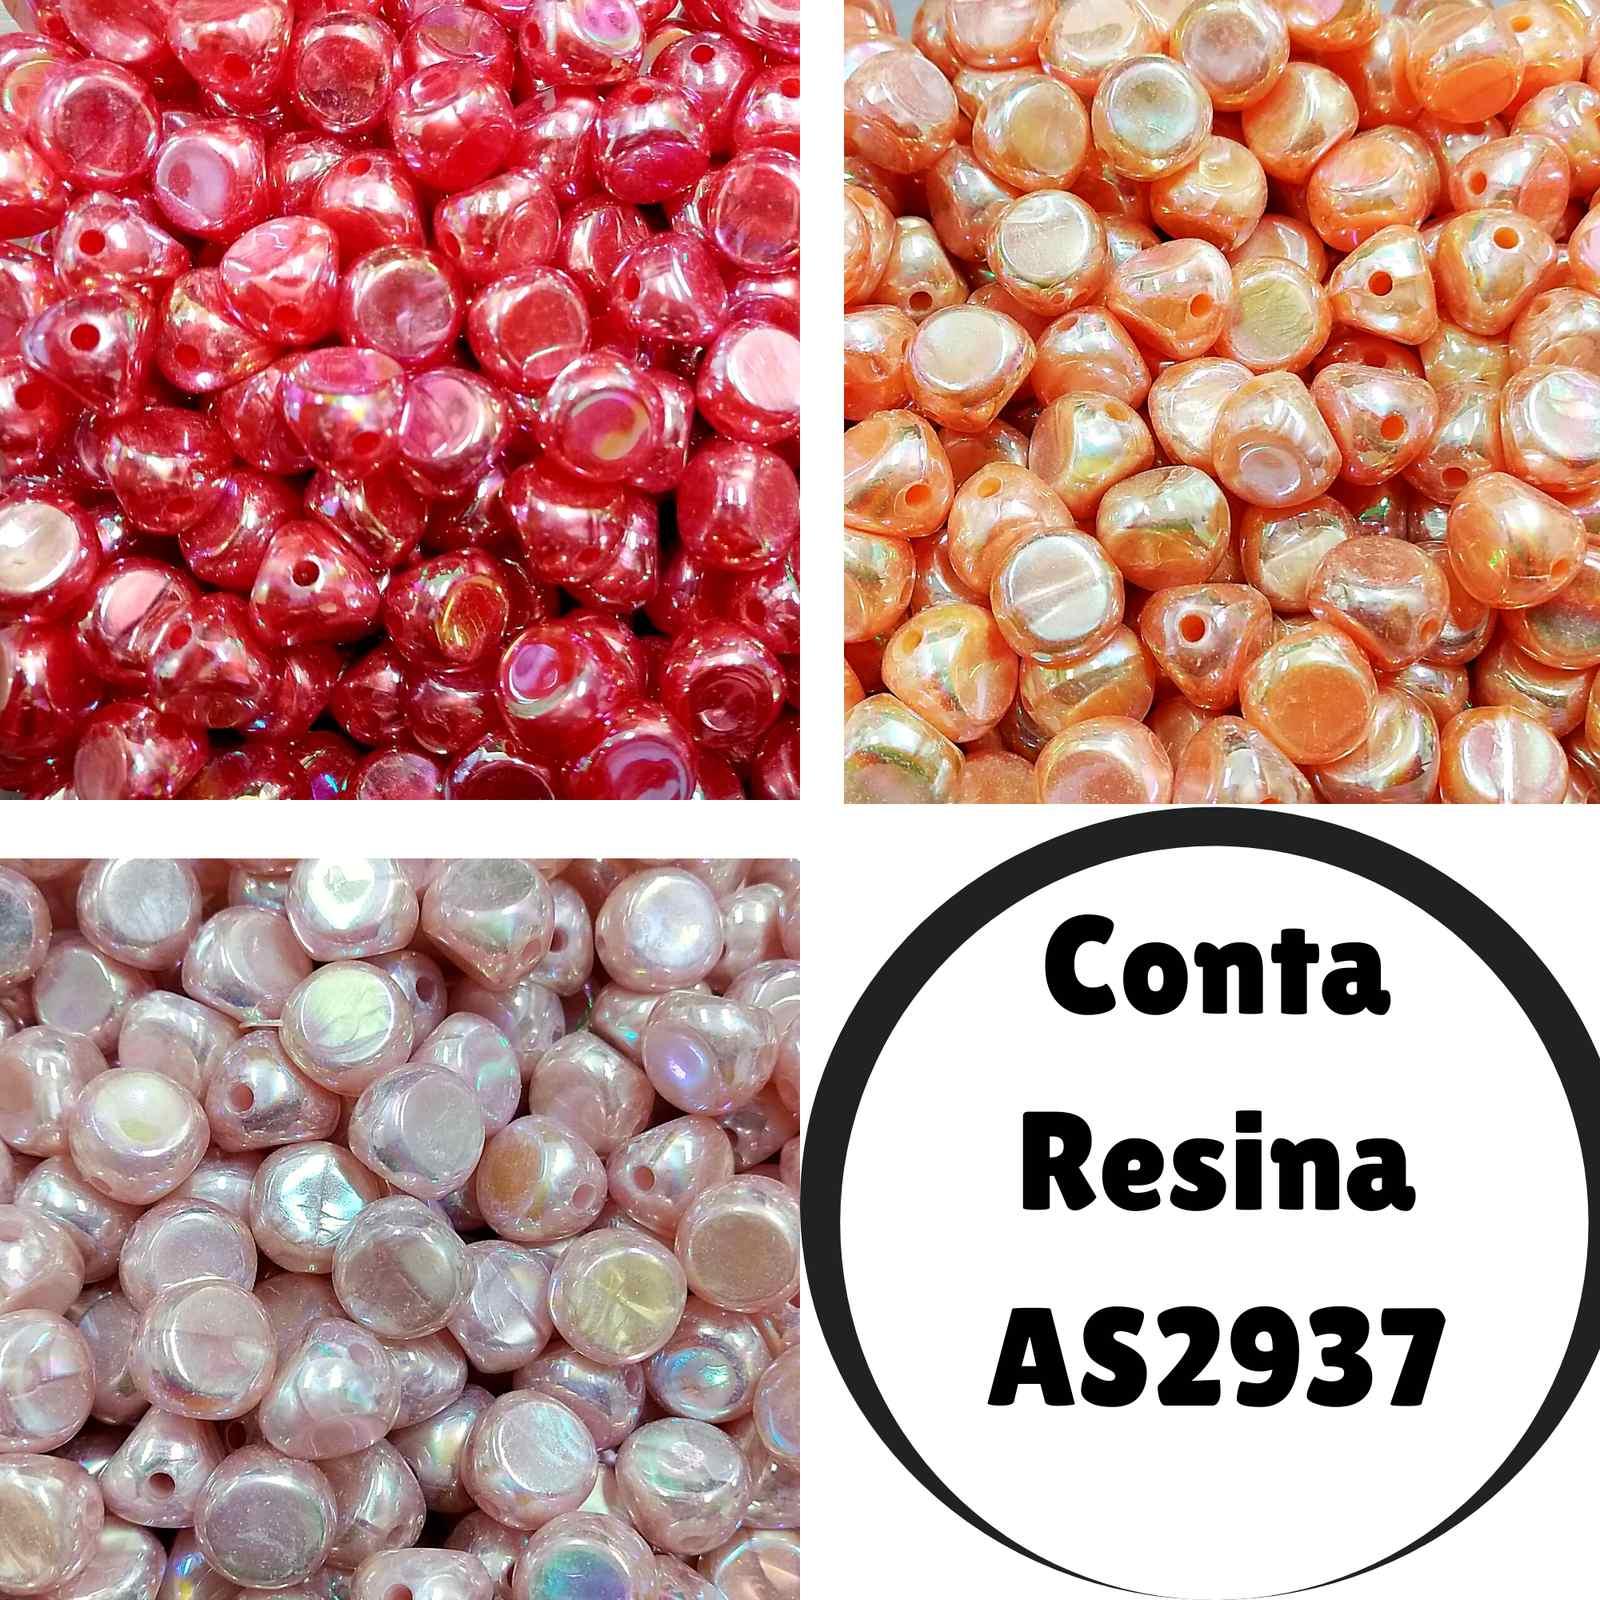 Conta Resina Metalica  AS2937 15mm c/500g